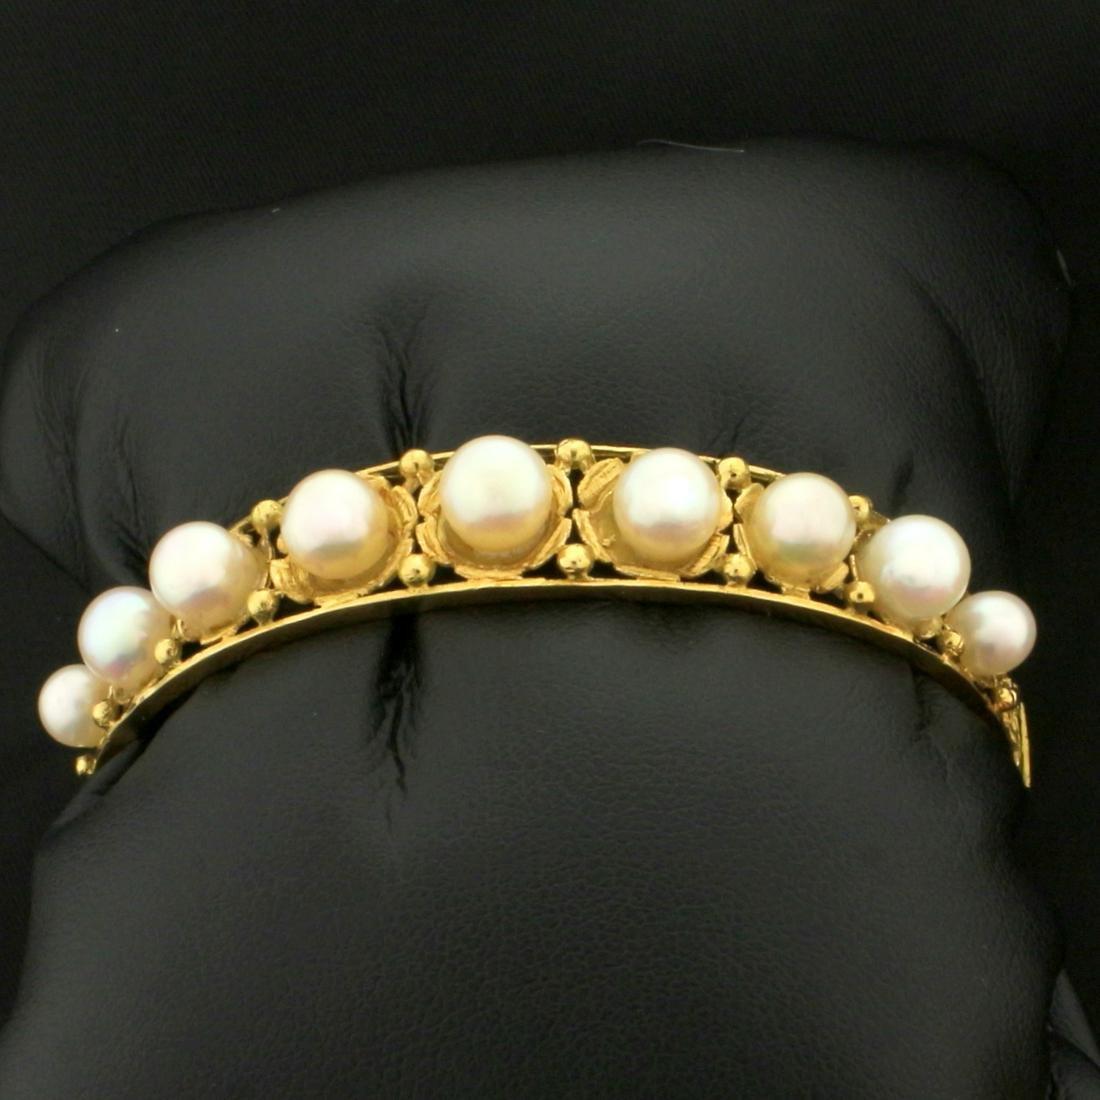 Vintage Akoya Pearl Bangle Bracelet in 18K Yellow Gold